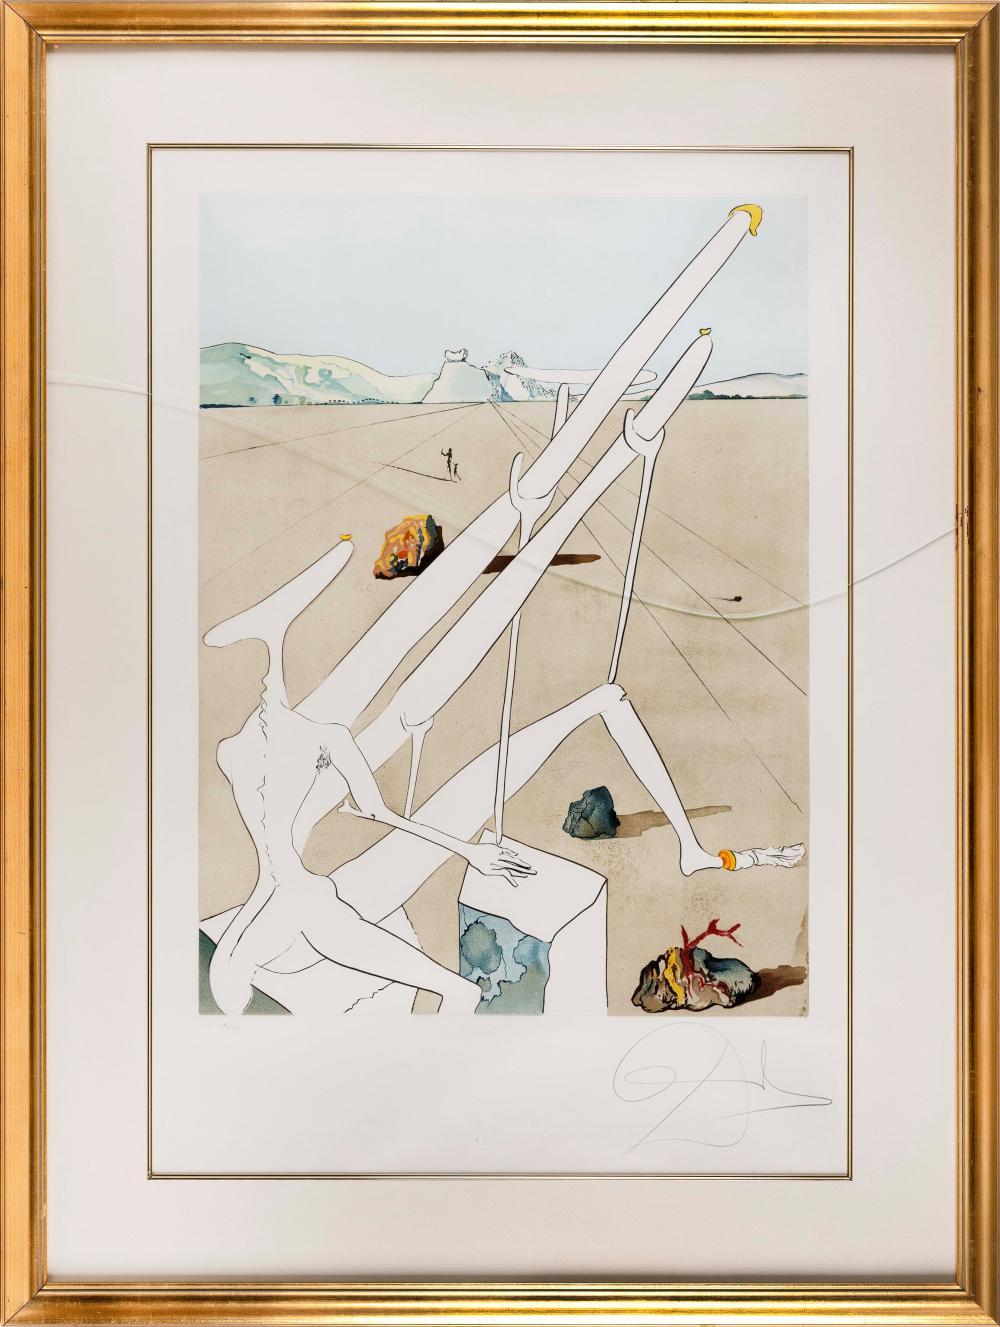 "SALVADOR DALI (France/Spain, 1904-1989), Surrealist composition., Lithograph, 37"" x 25"" sight. Framed 48"" x 36""."